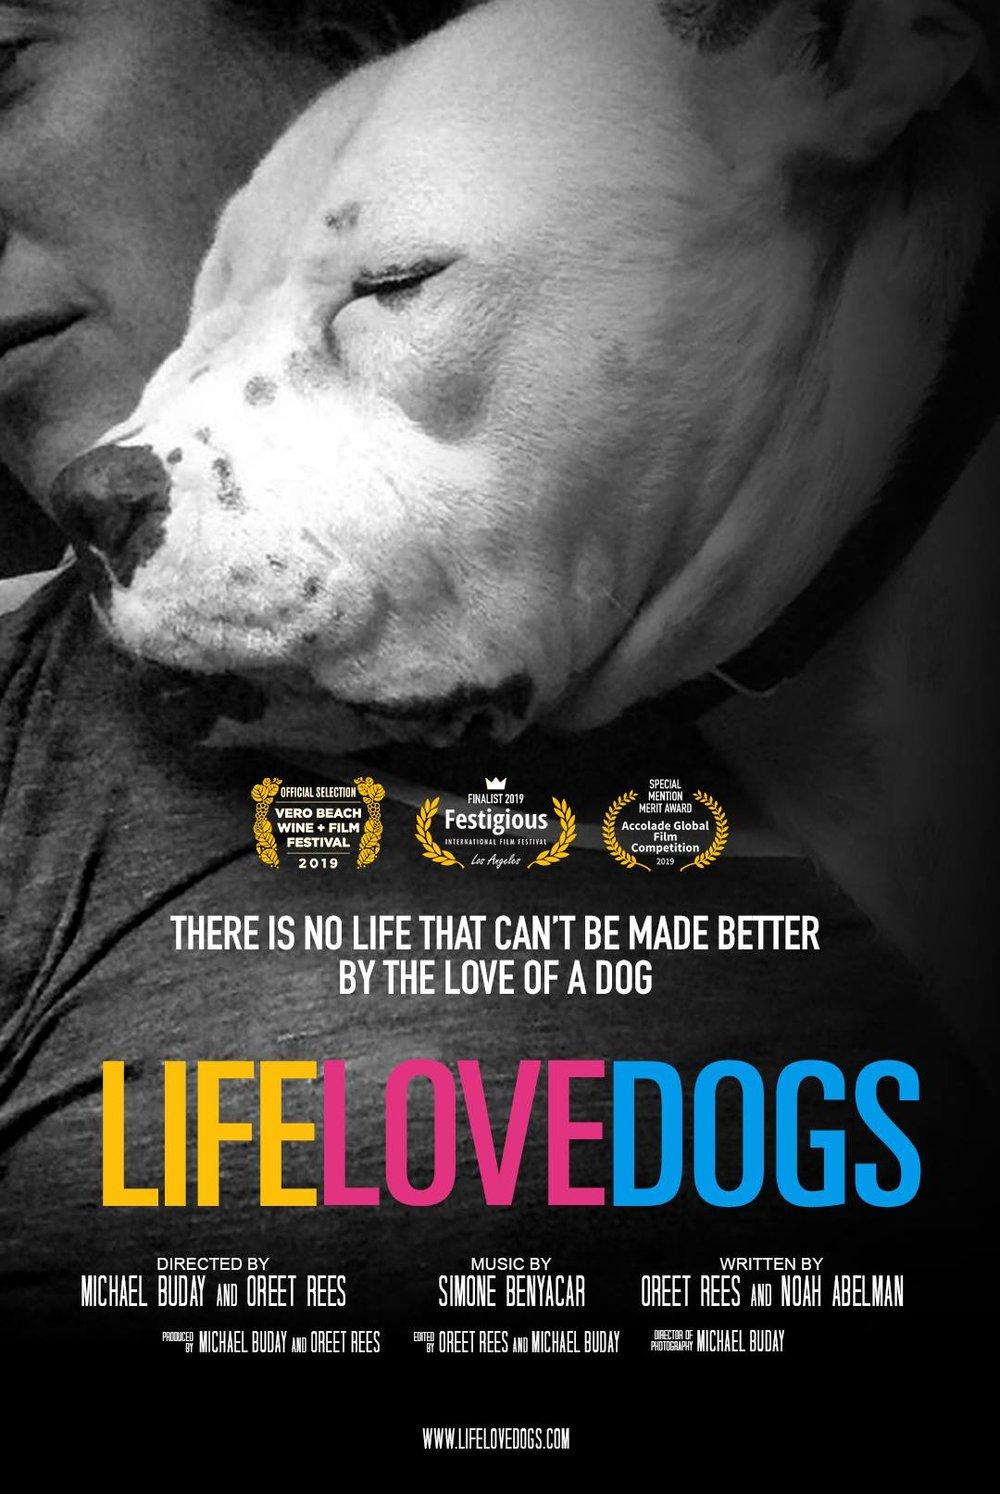 Life. Love. Dogs.